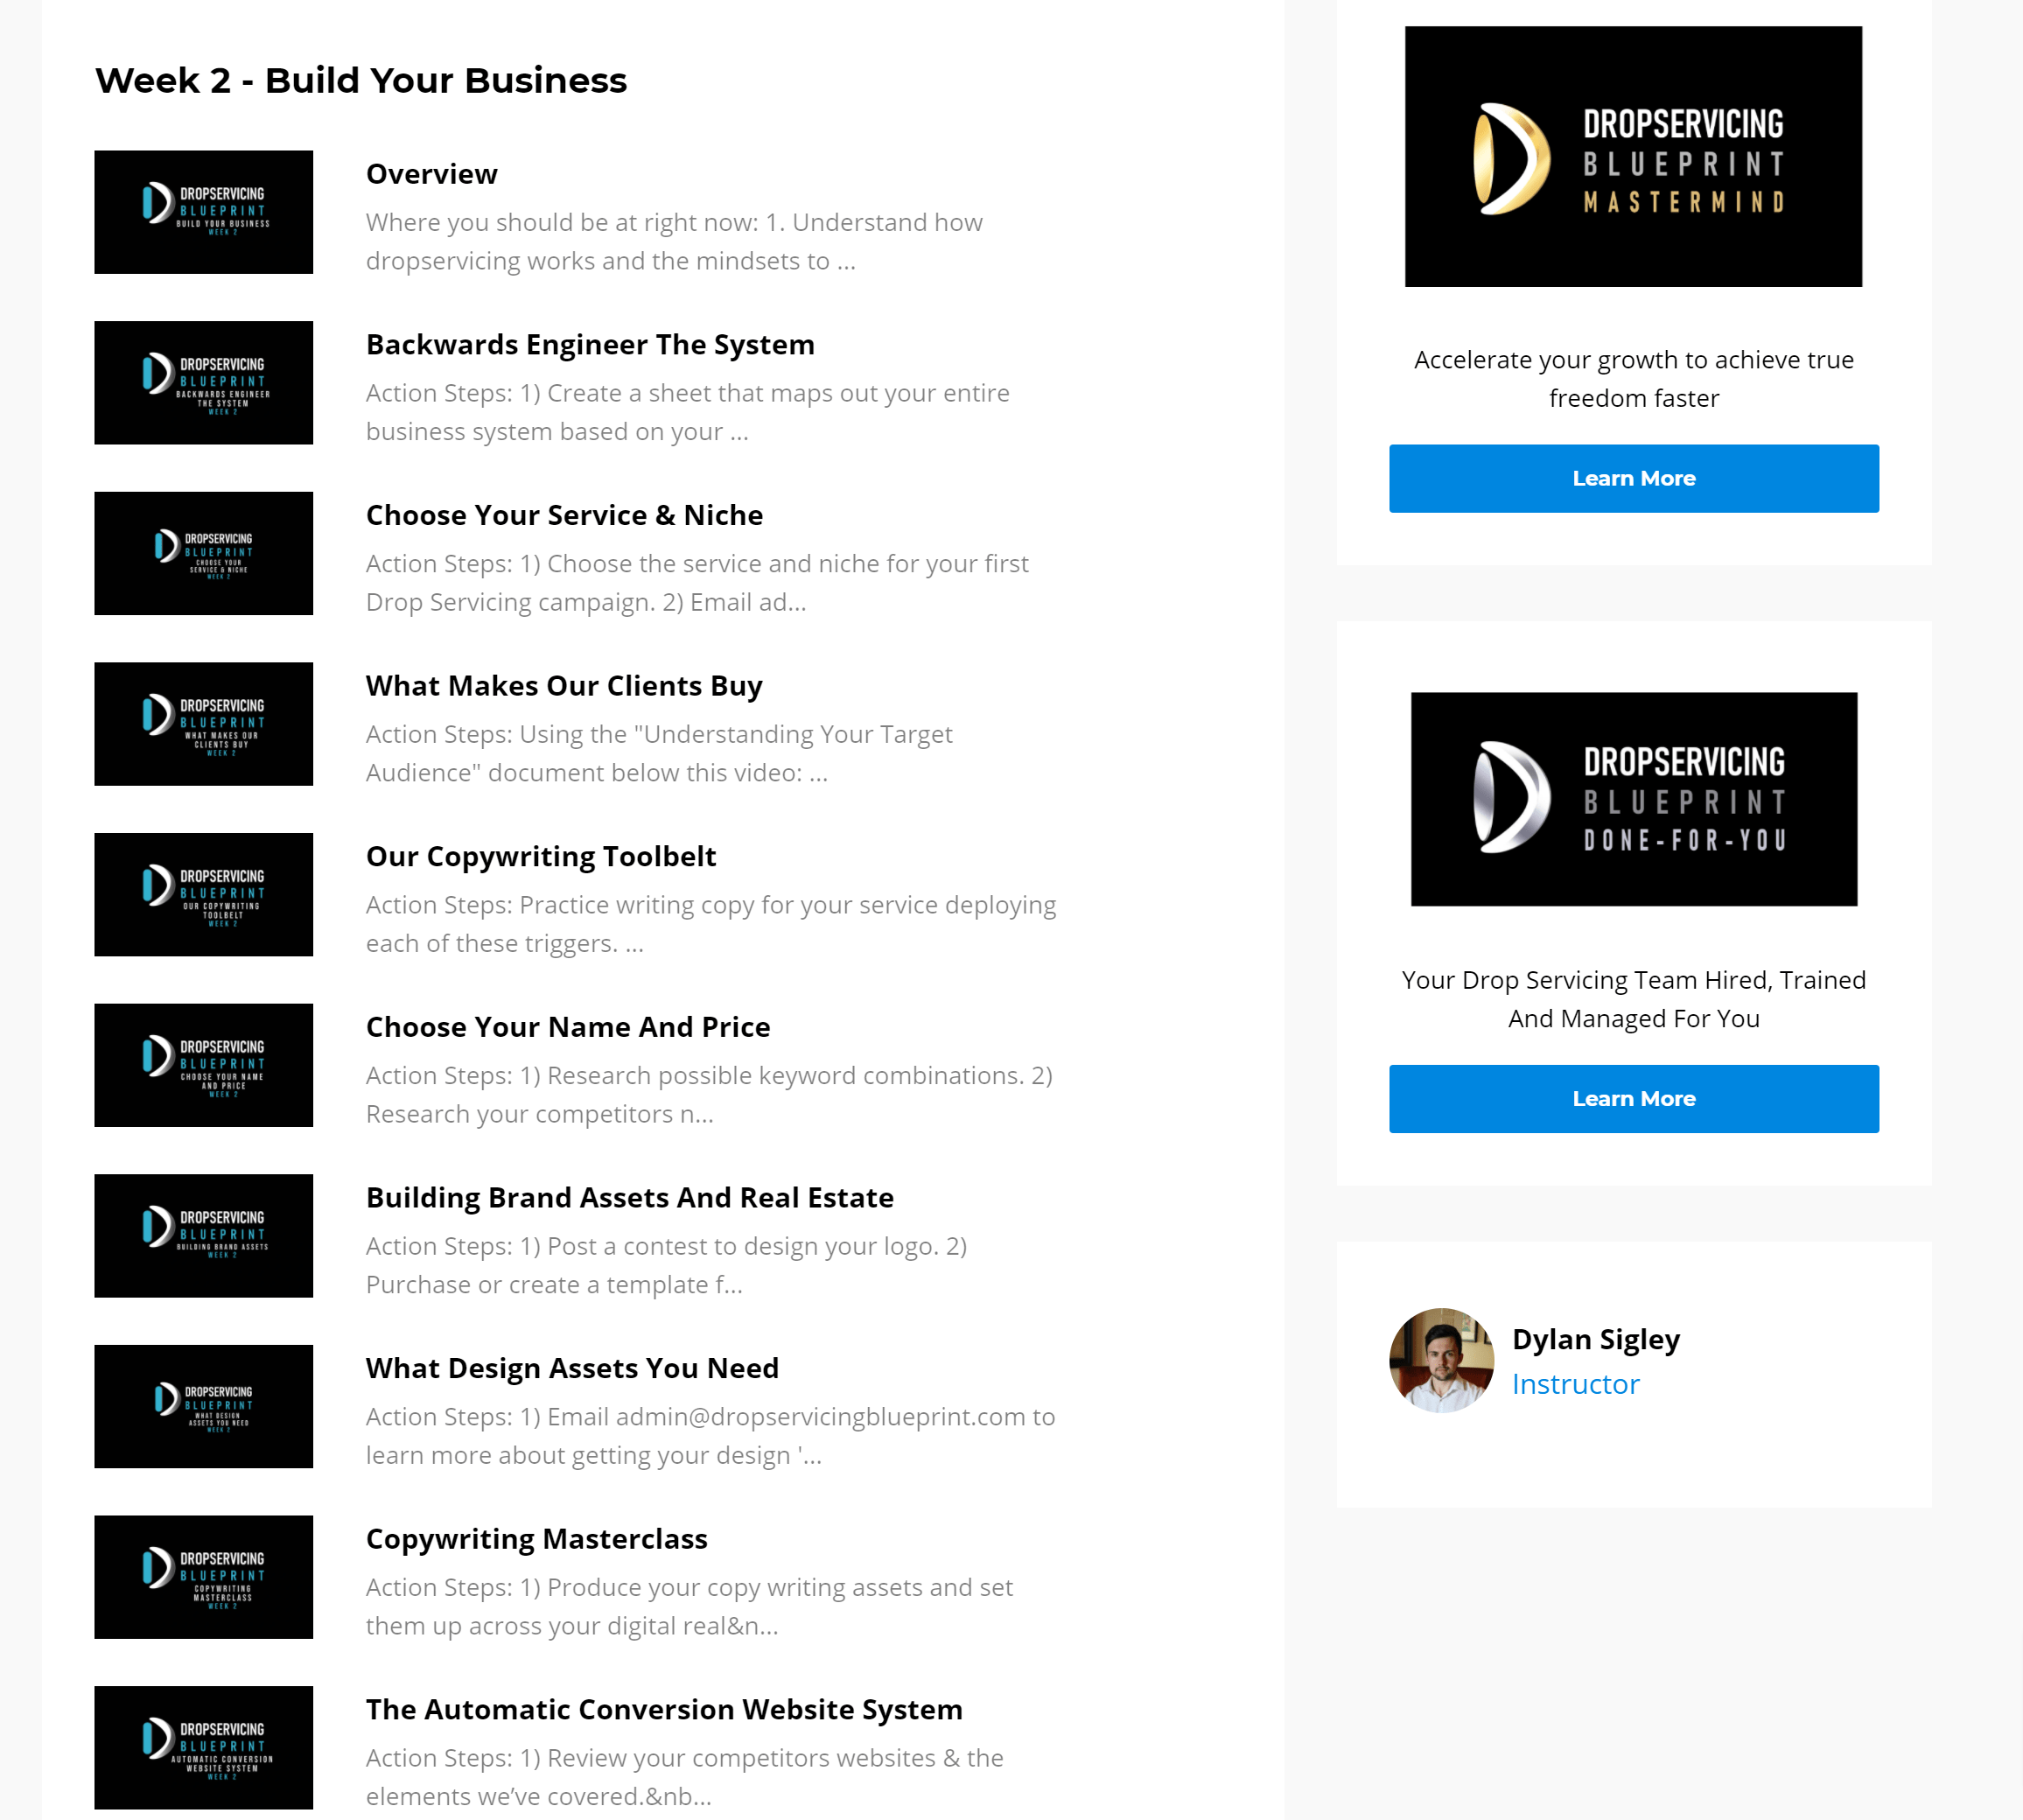 Drop Servicing Blueprint reviews online